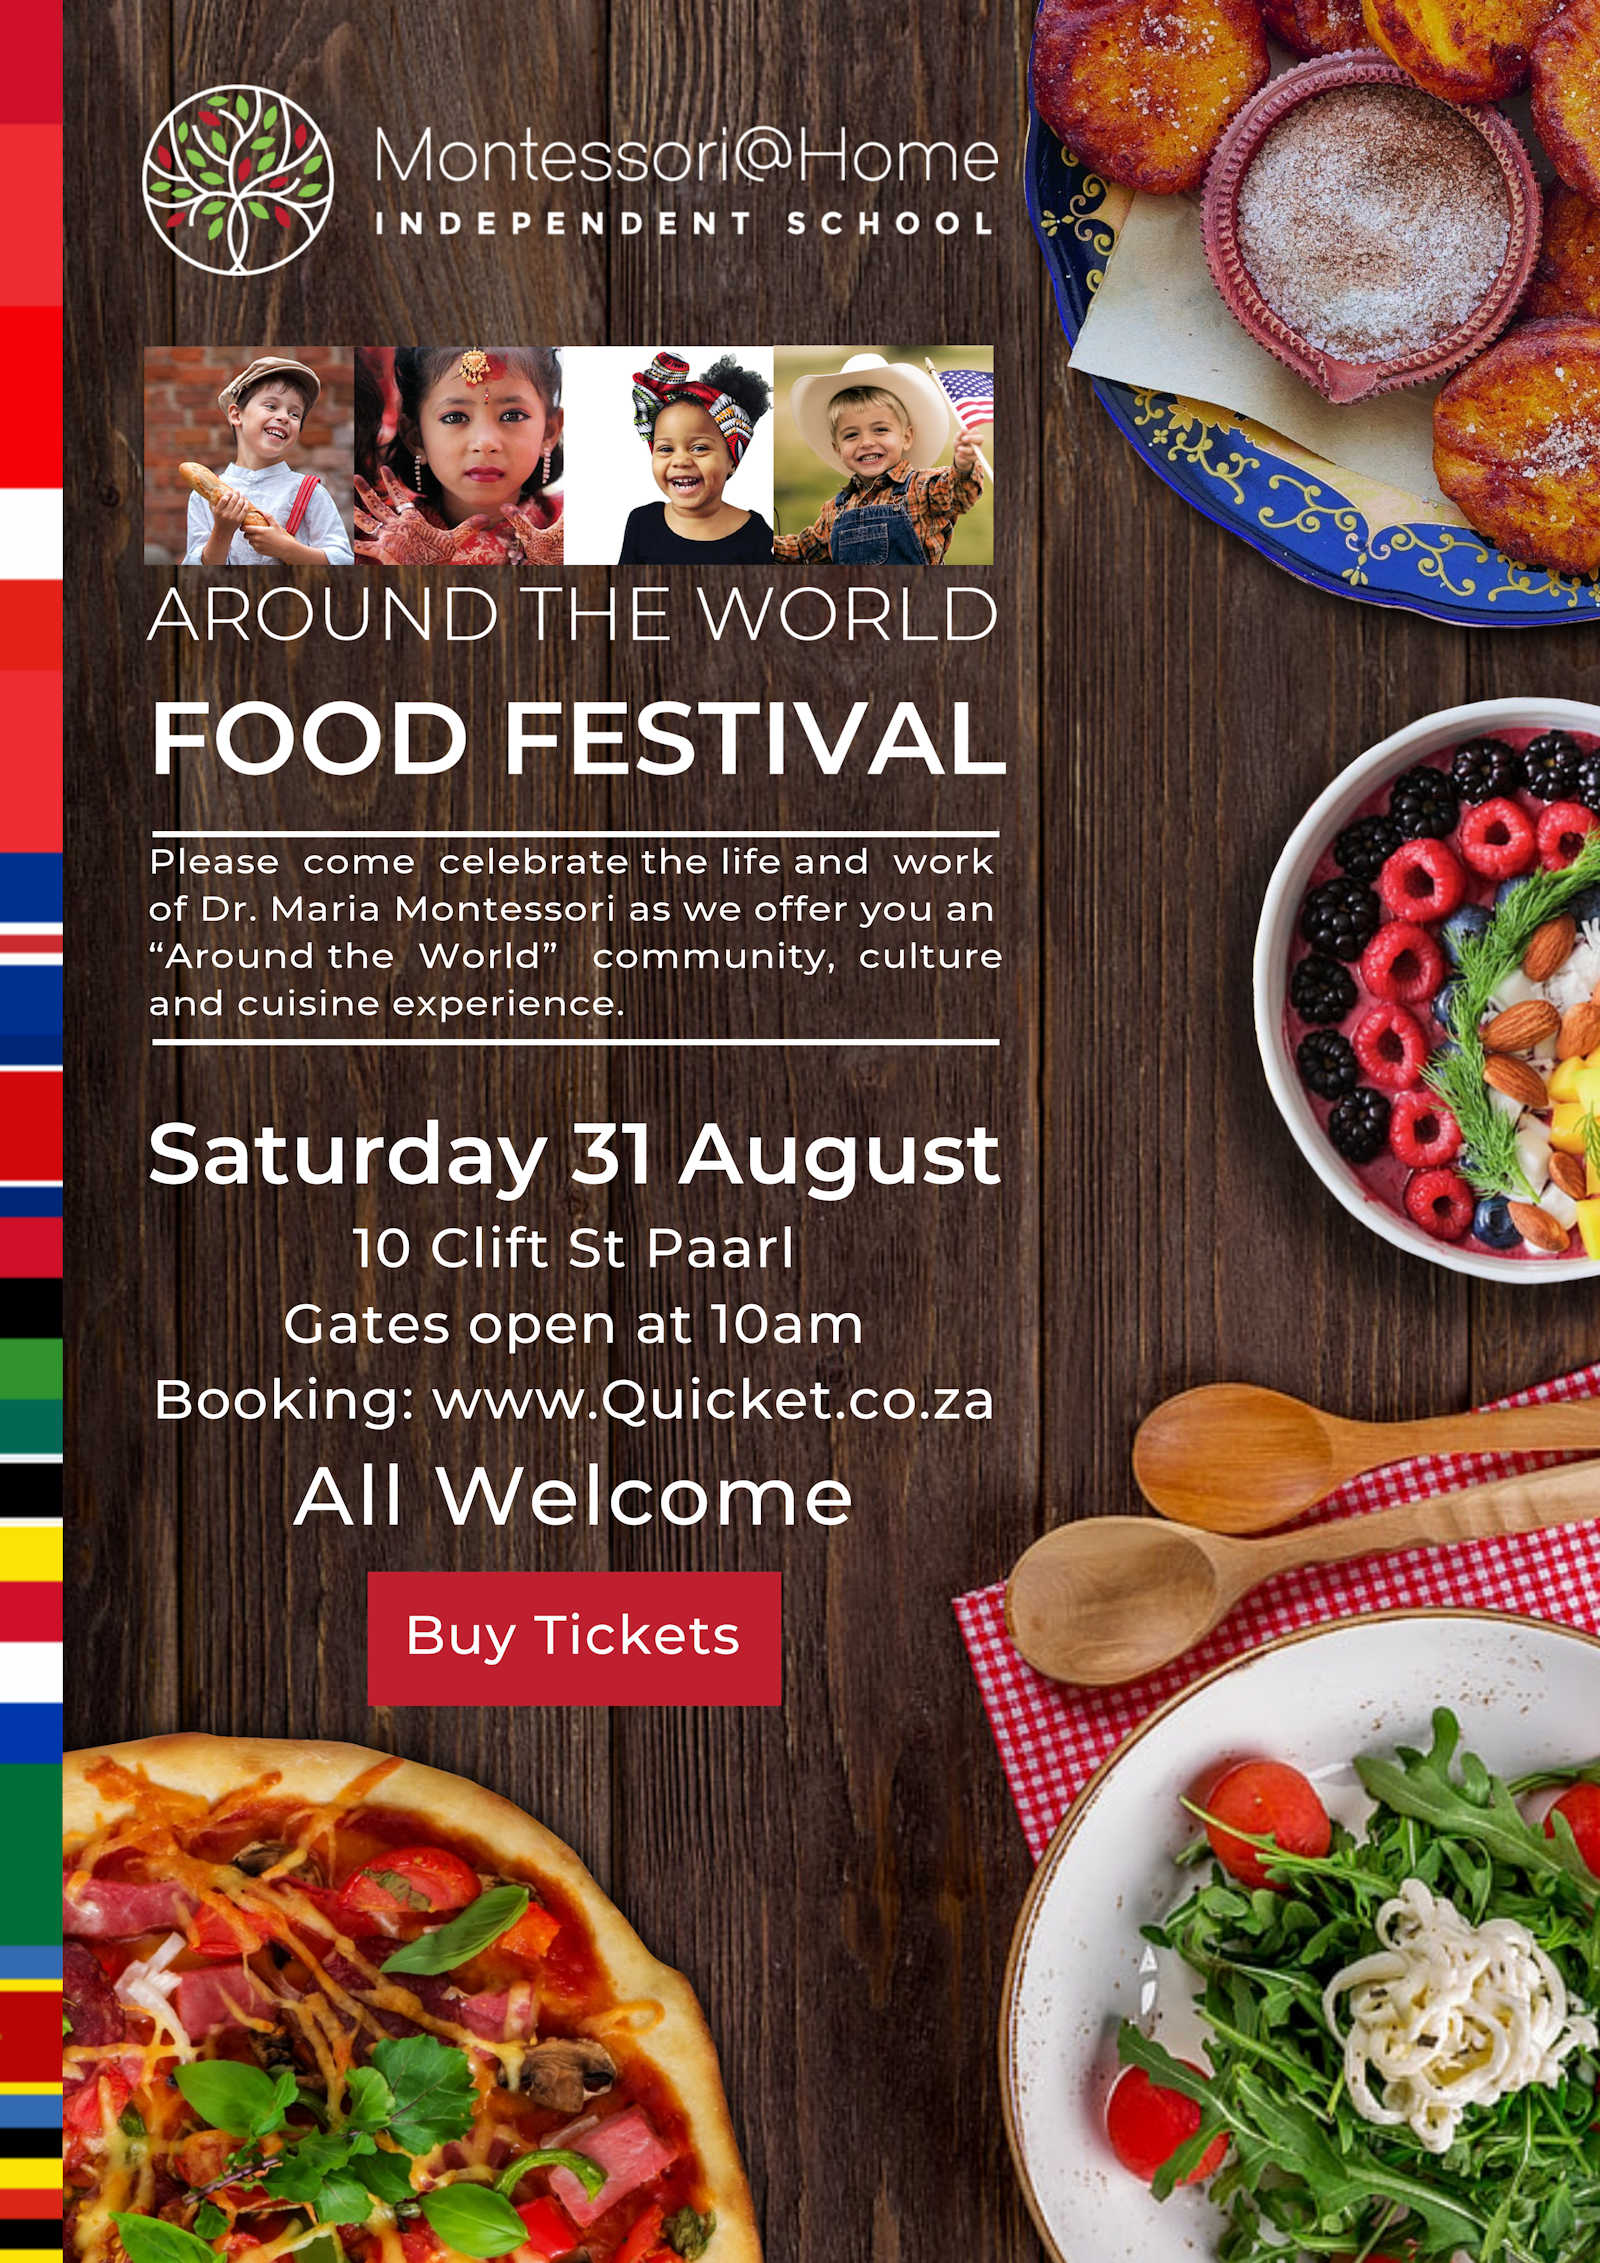 Montessori at home marketing Food festival poster web.jpg